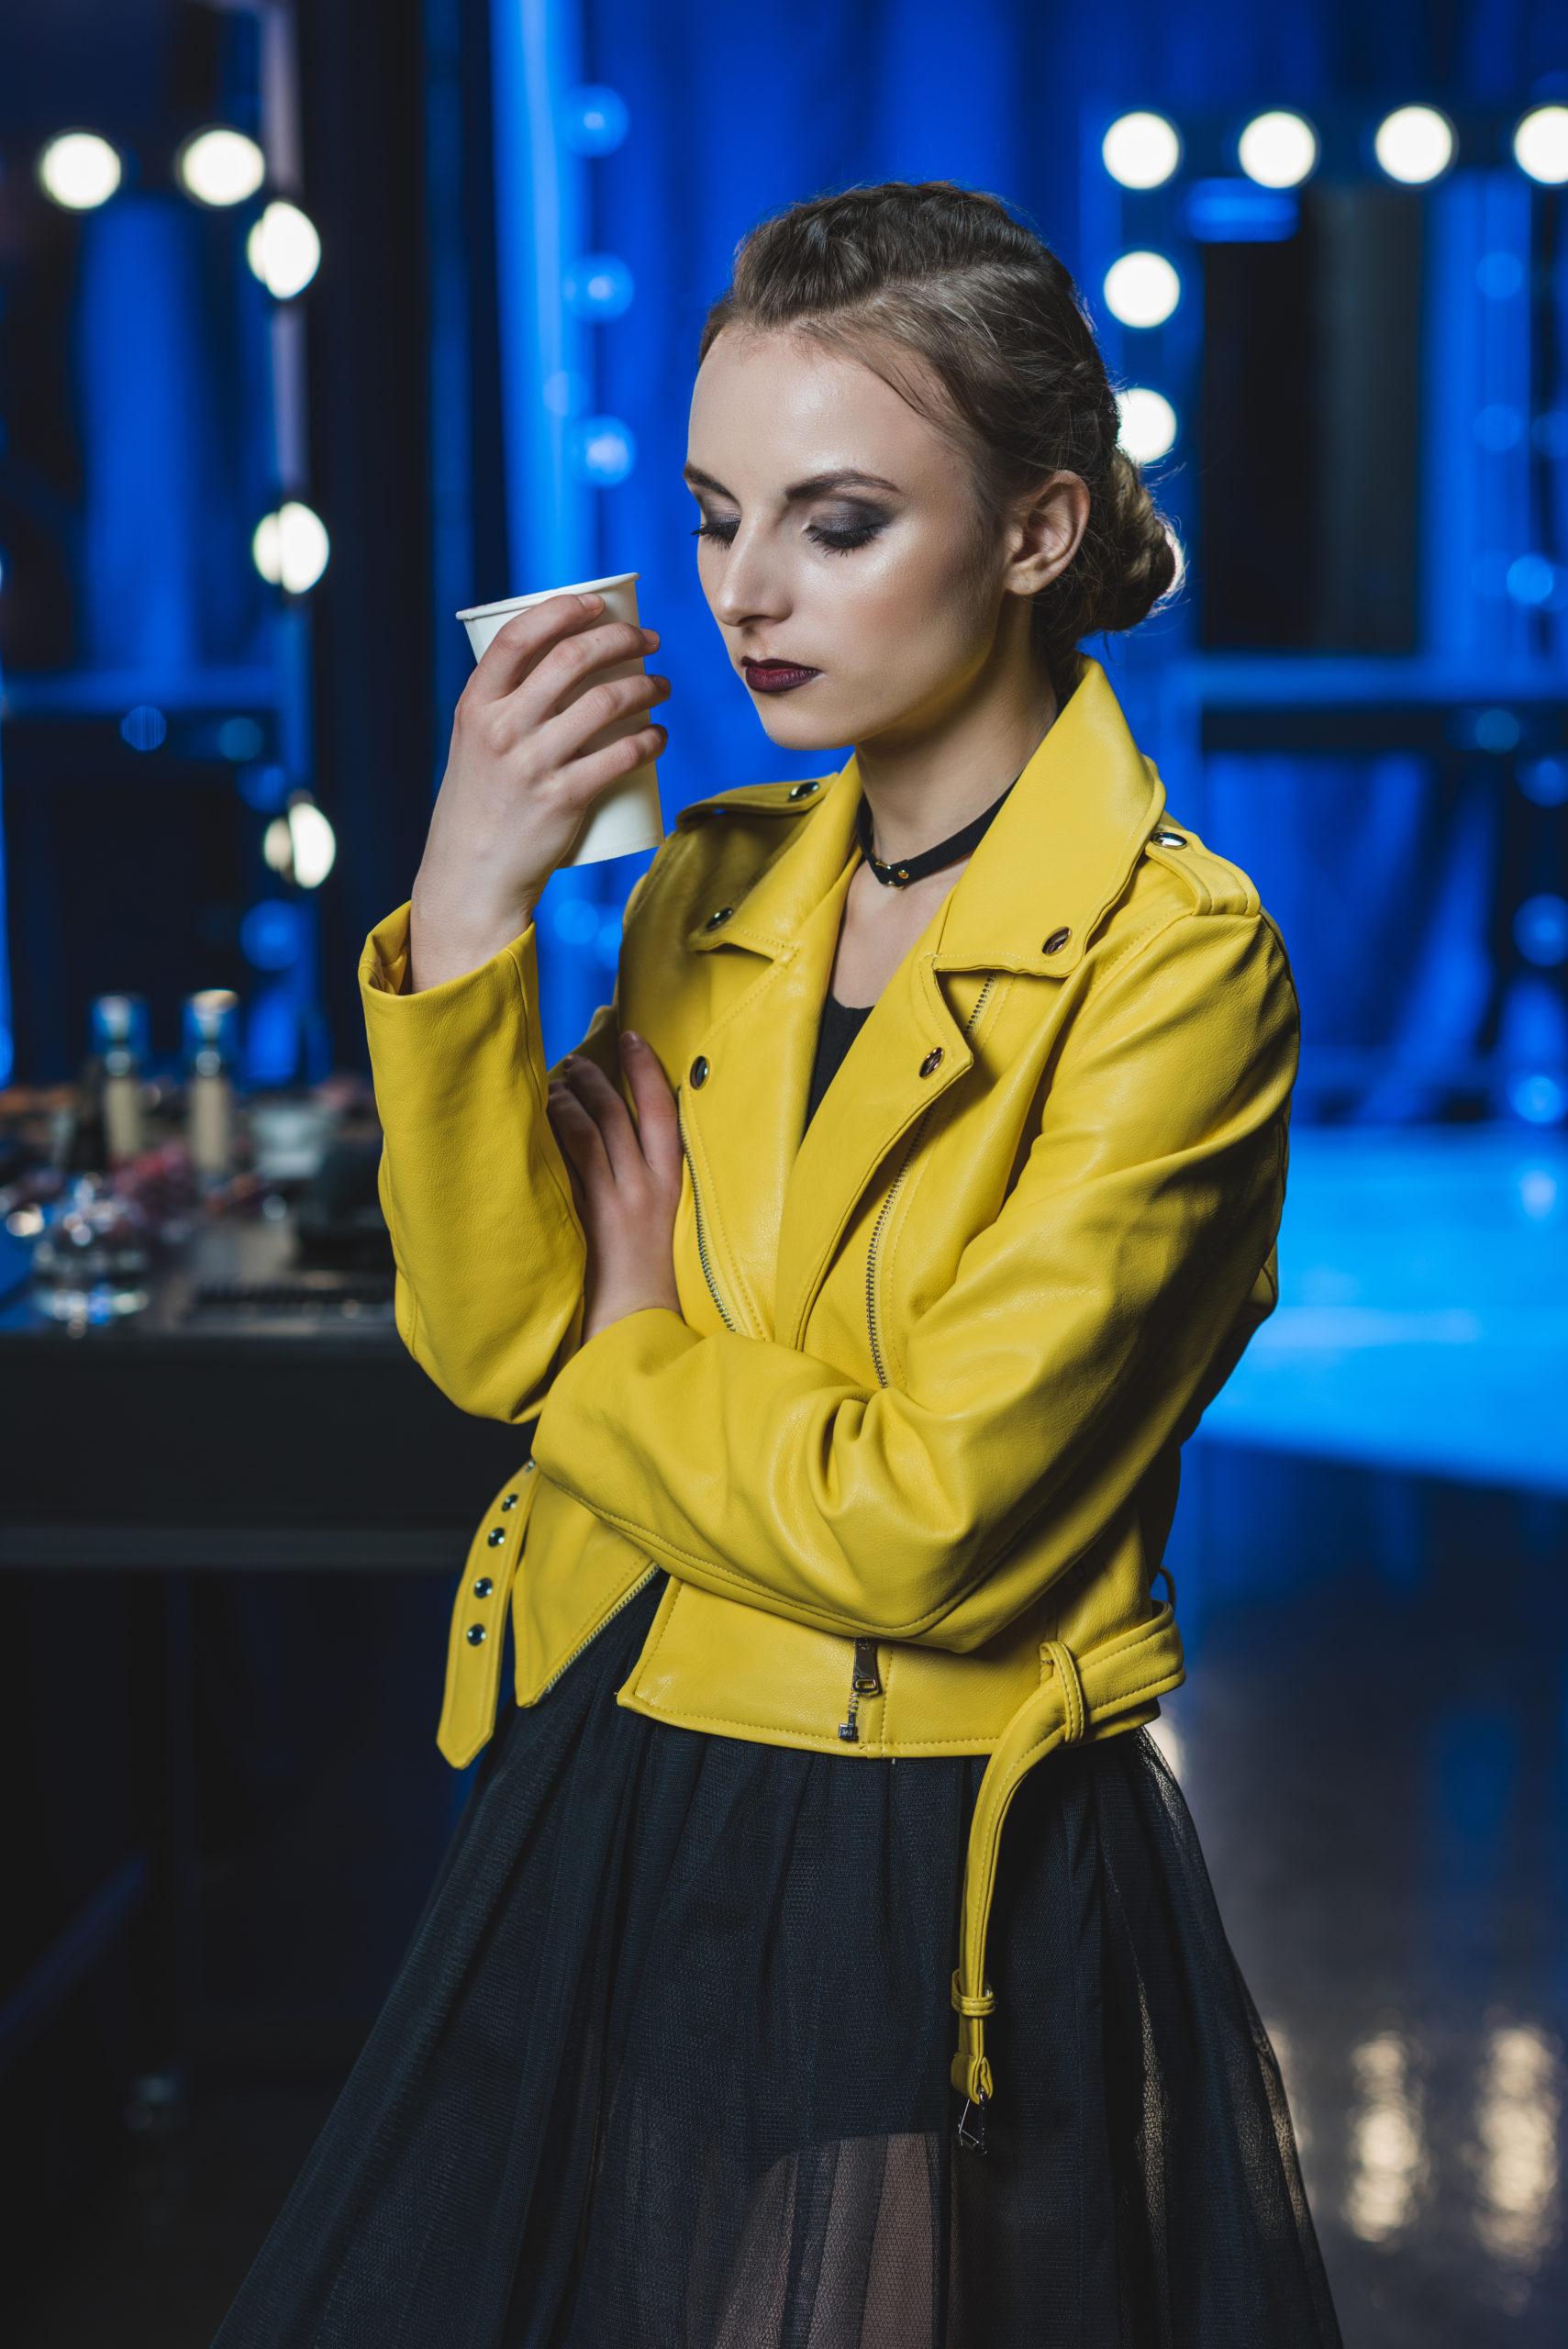 Attractive girl with makeup @ NatashaFedorova